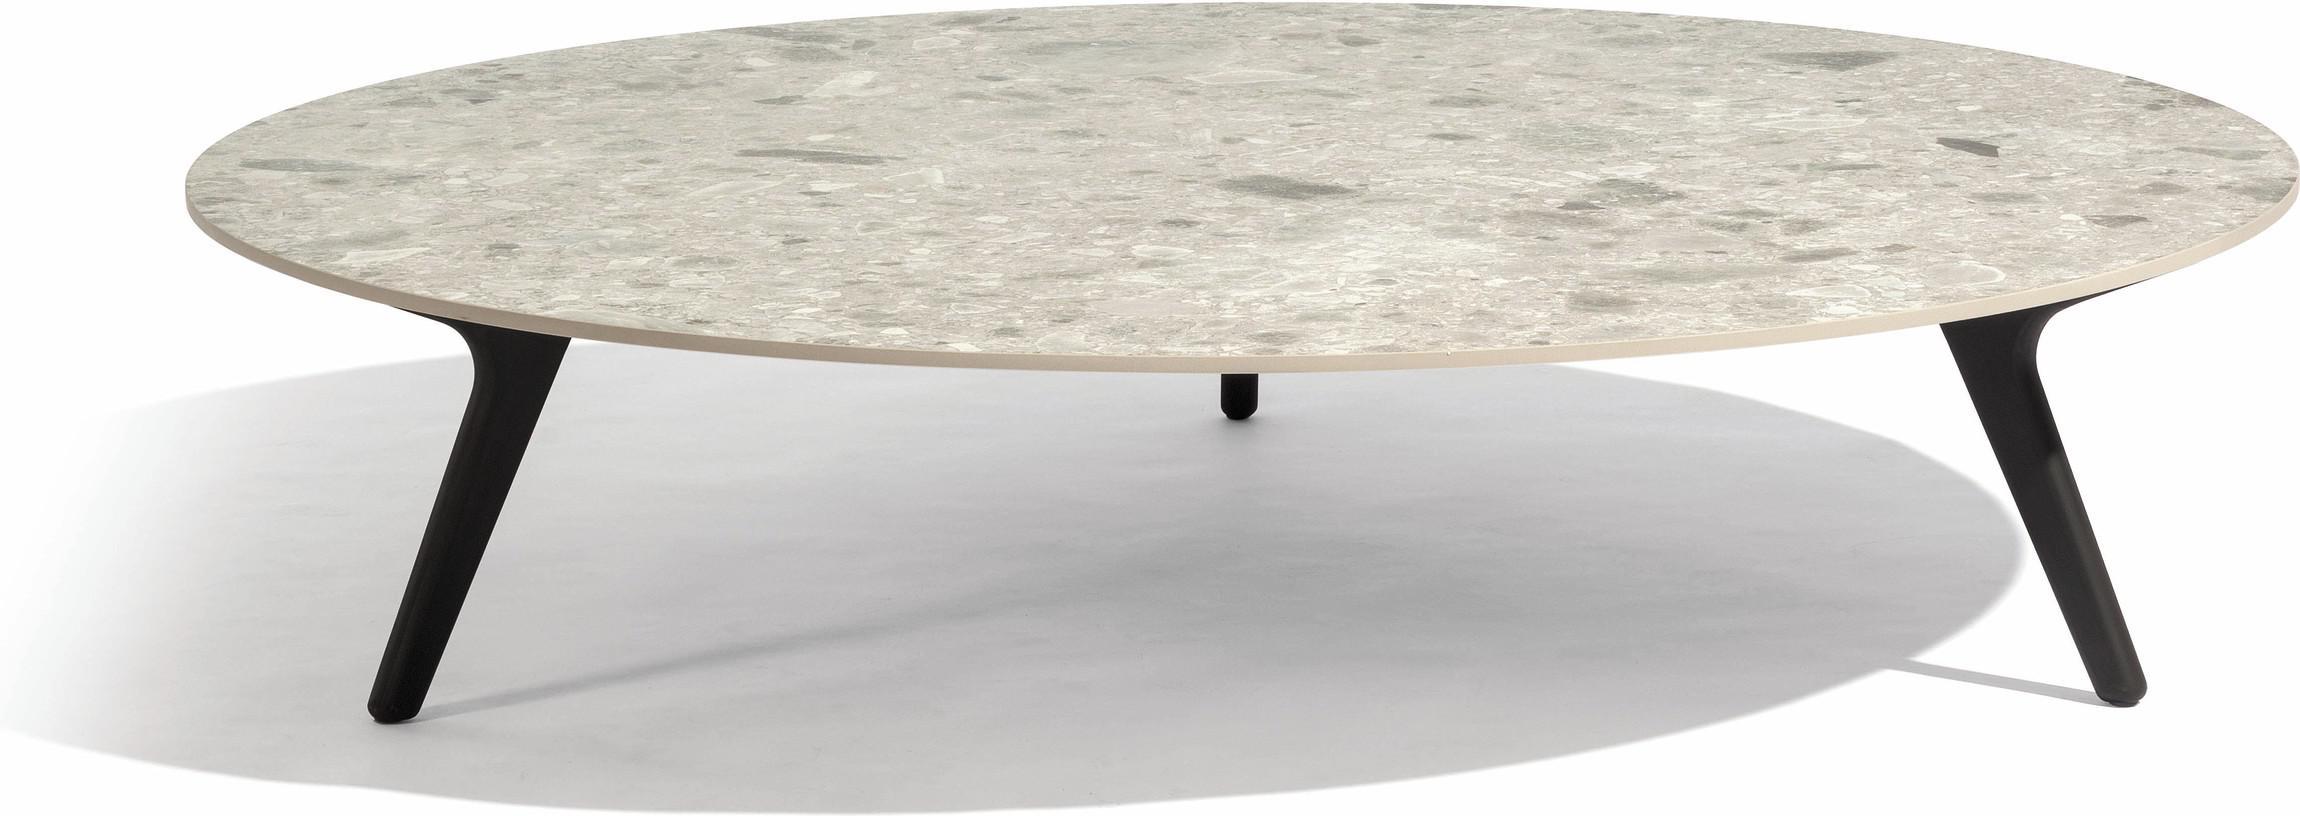 Torsa Low table - Teak nero - CF 105